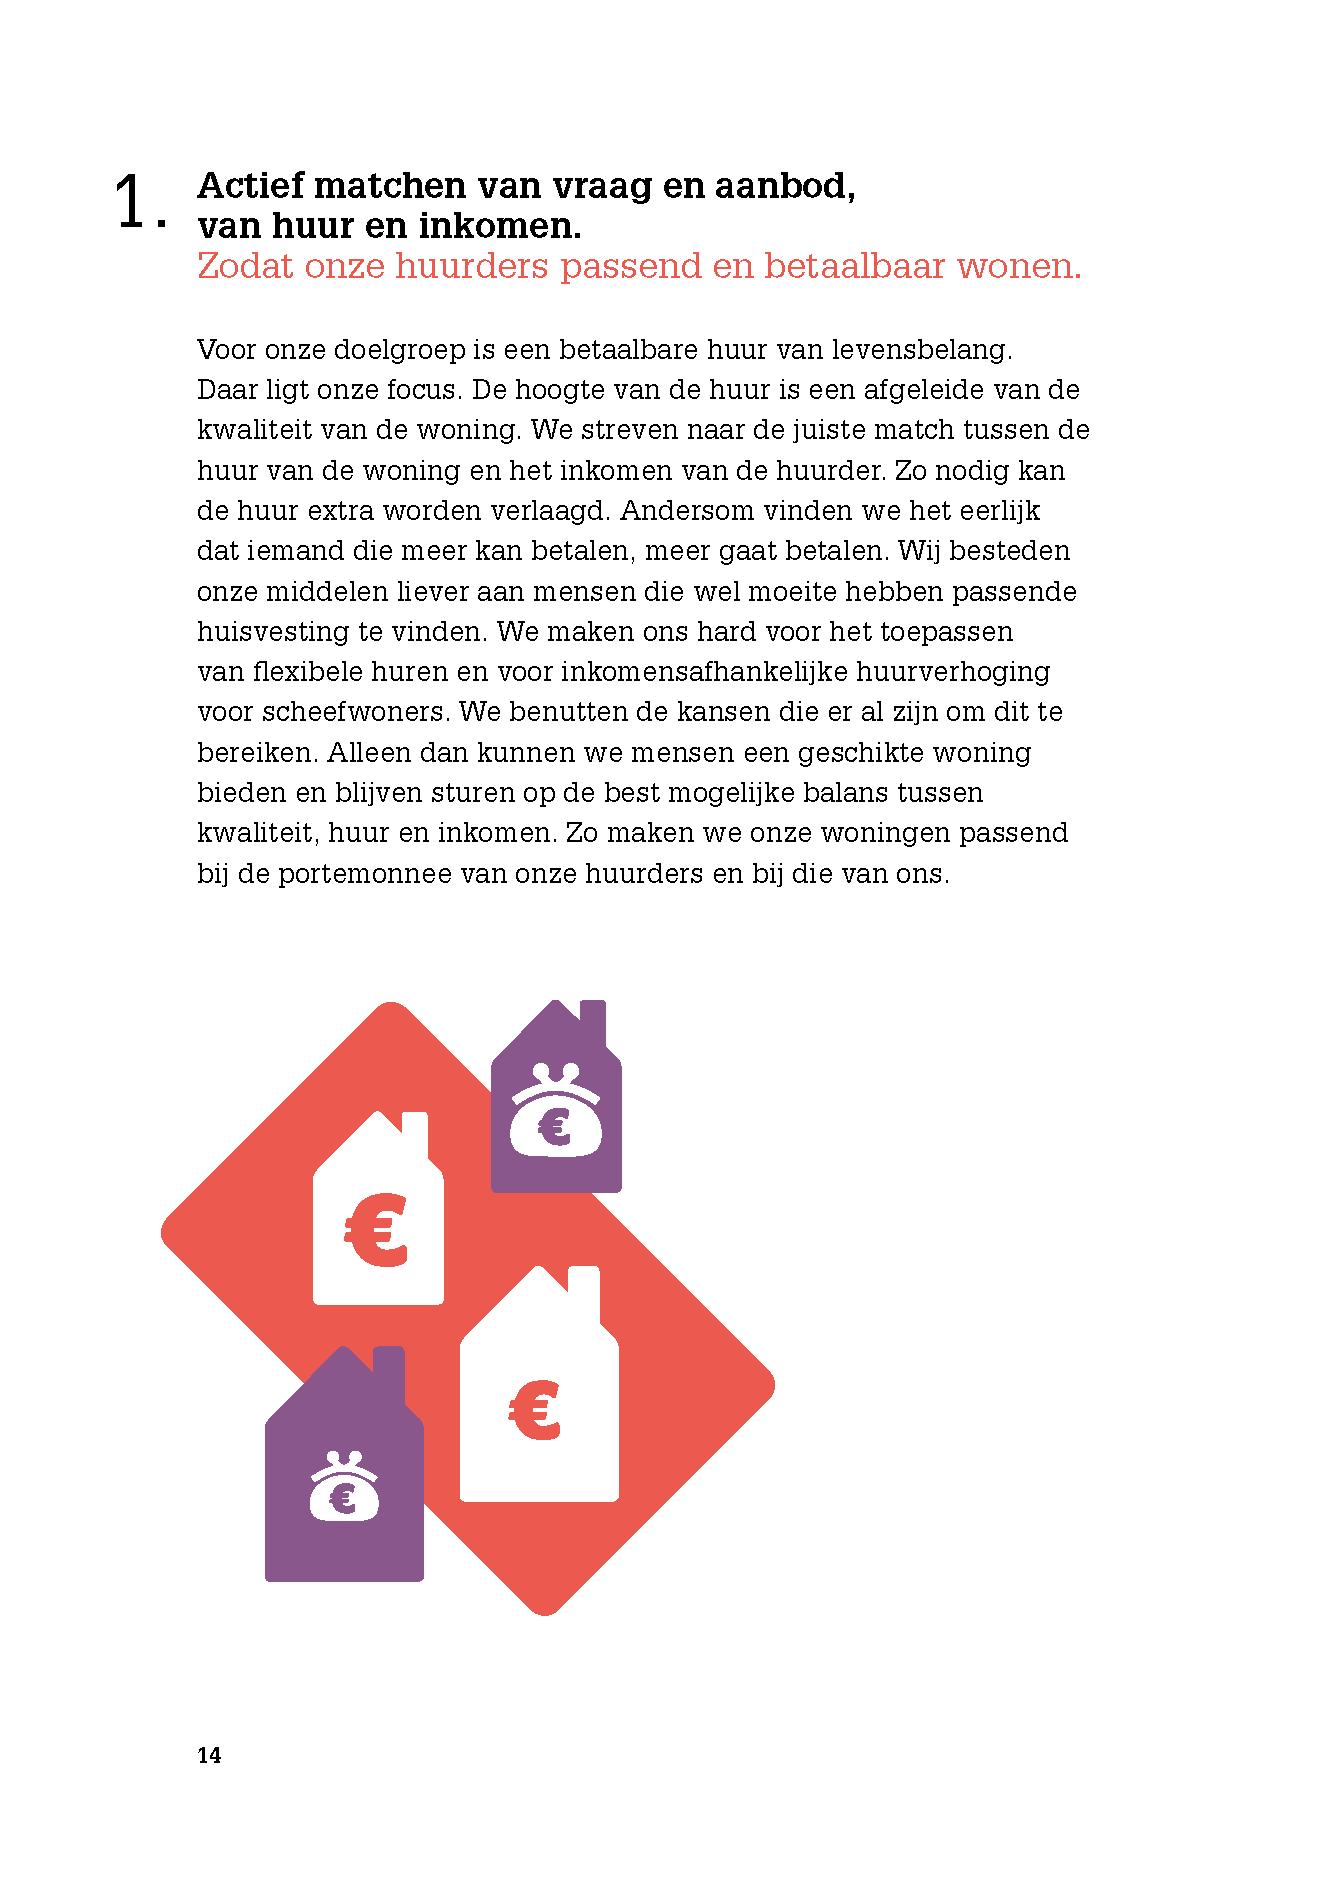 ymere_strategie2015_023_17x24rgb_page_14